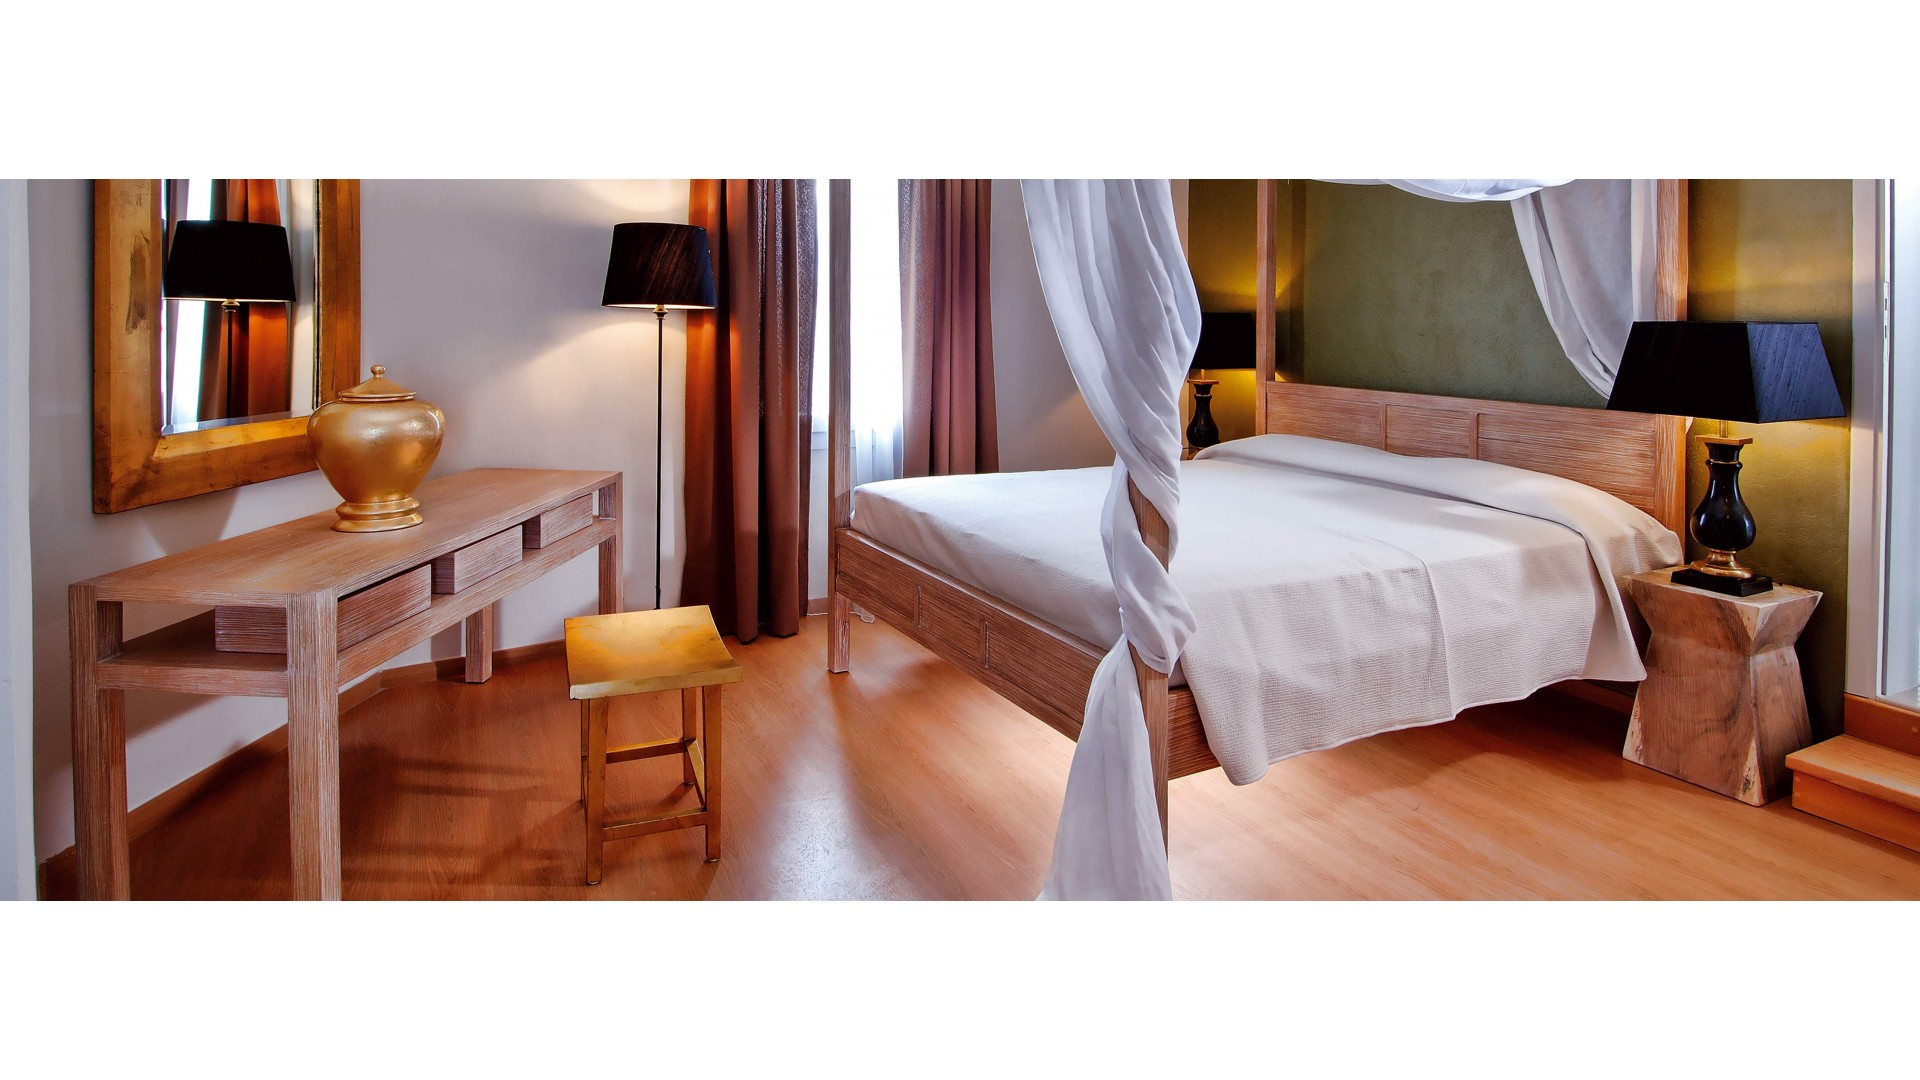 Paradise island villas hotel anissaras crete smith hotels